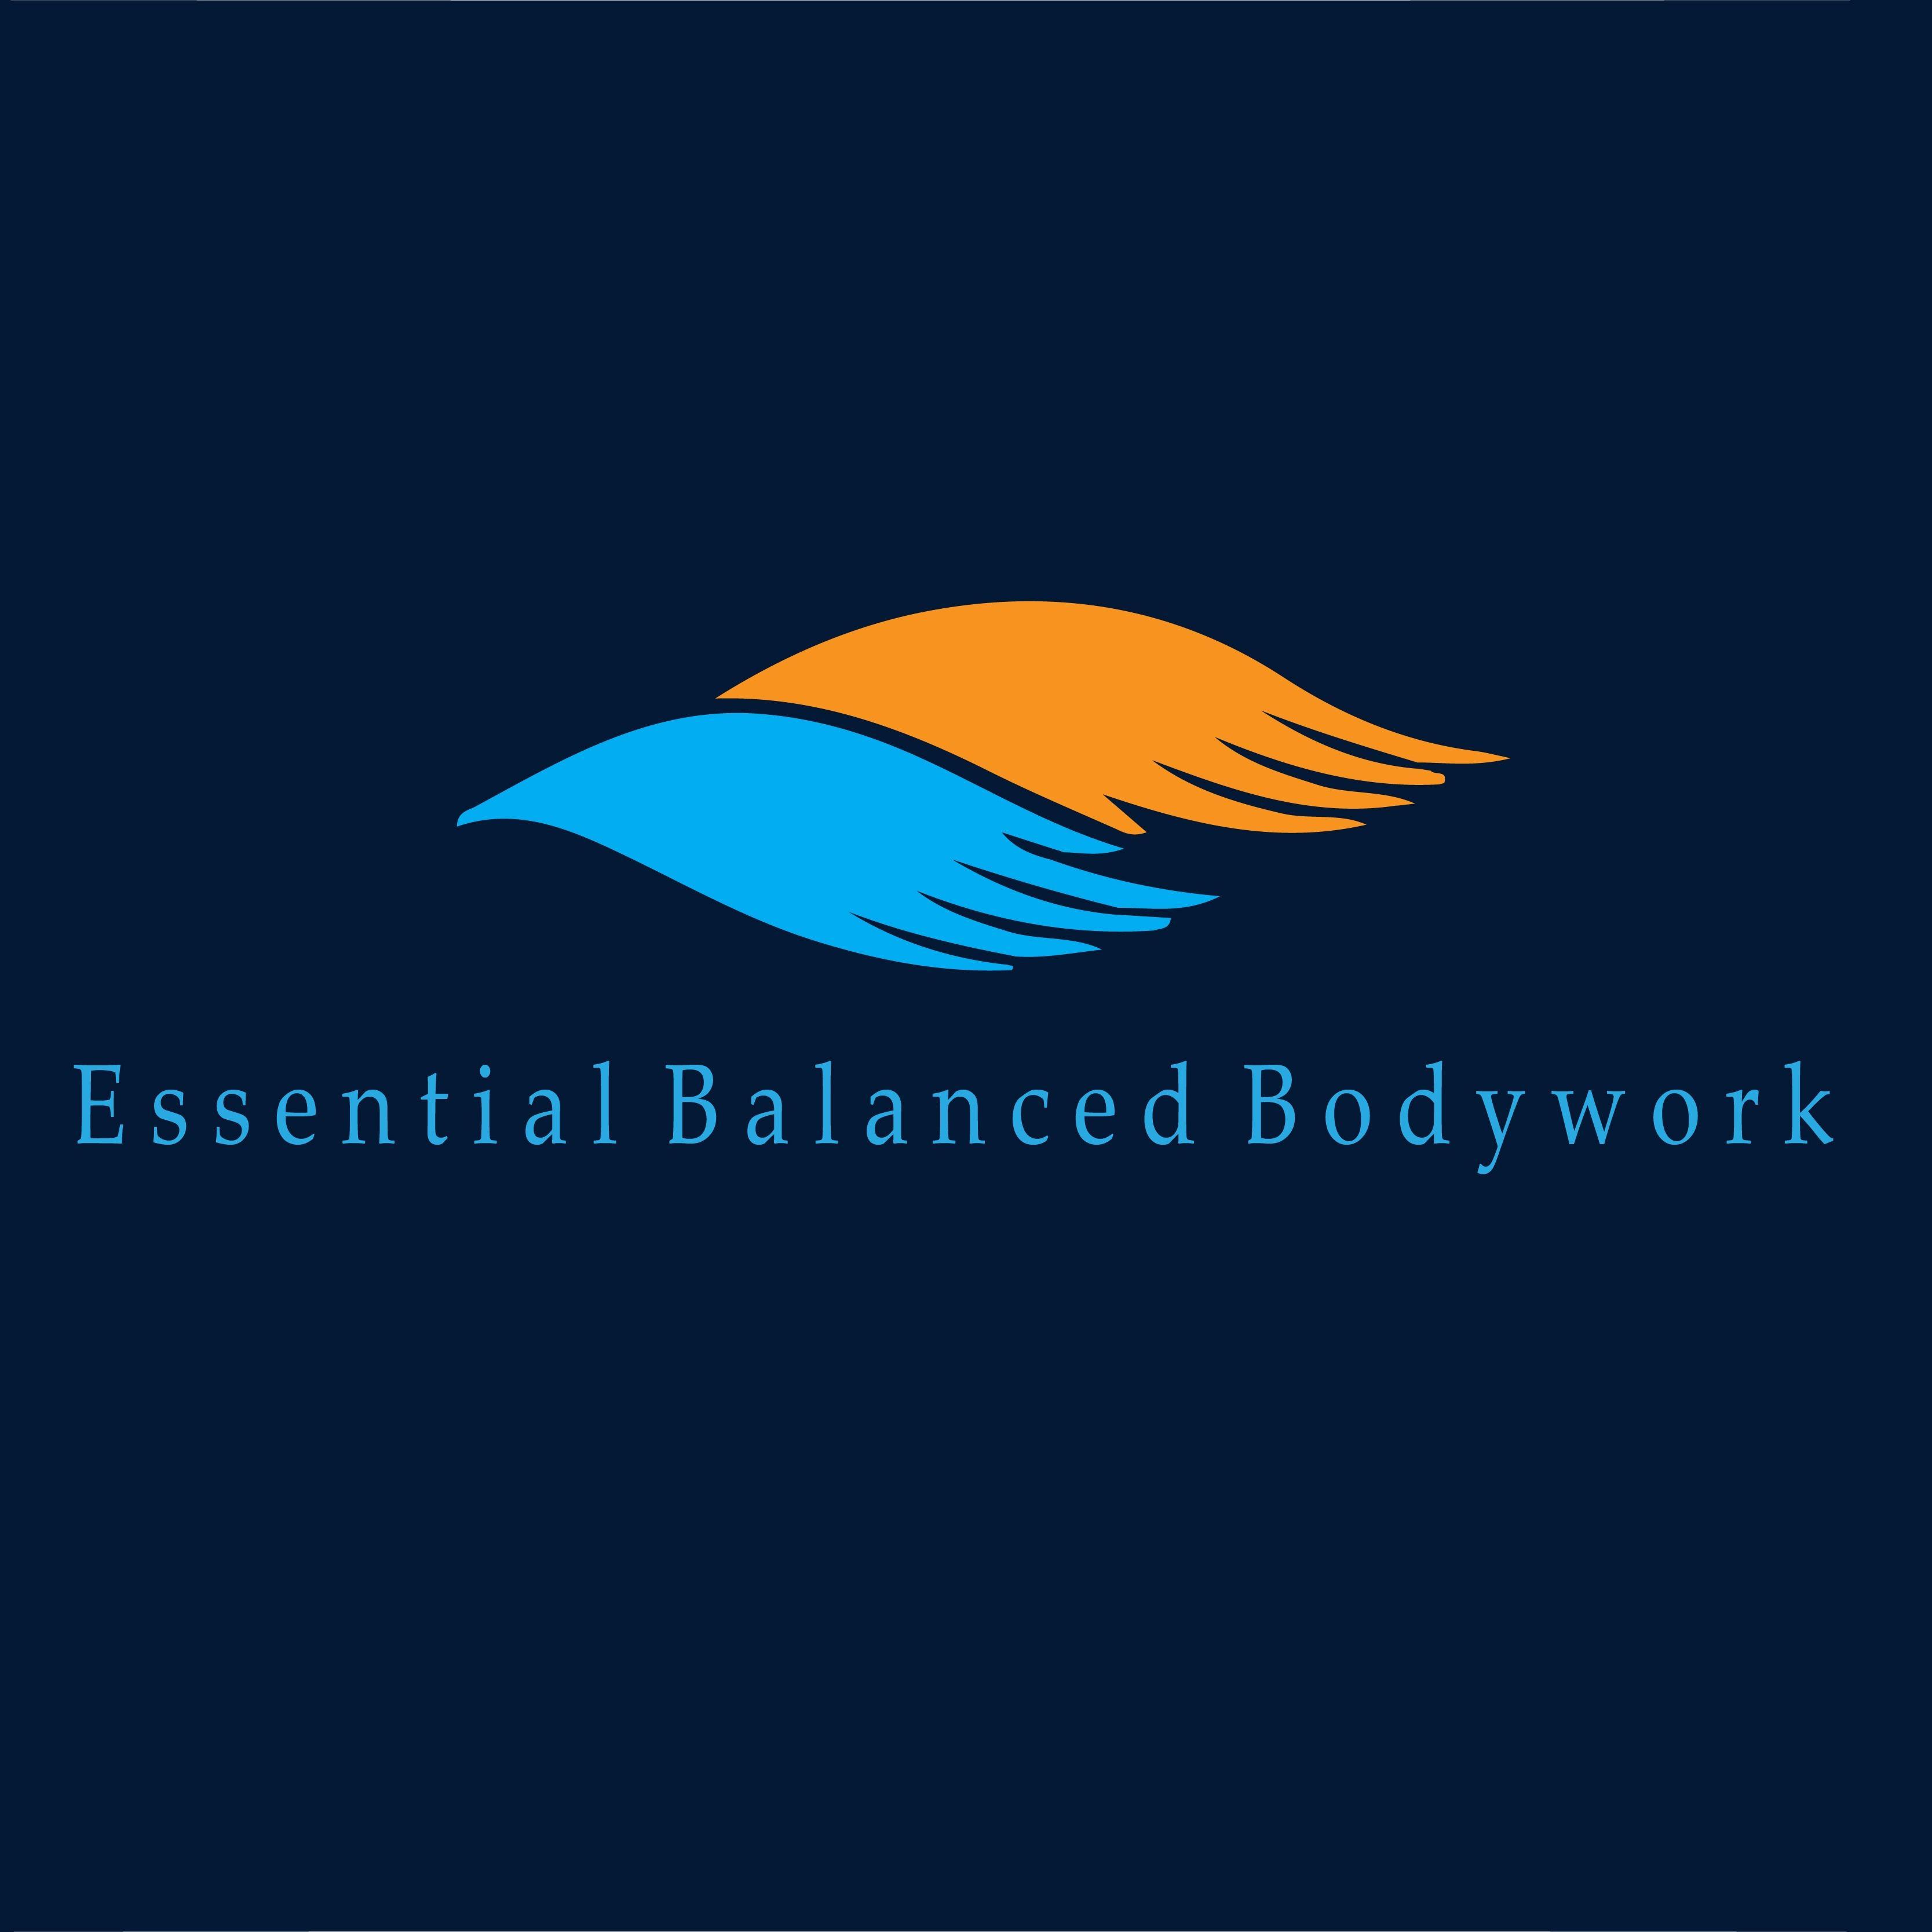 Essential Balanced Bodywork - Clemmons, NC - Massage Therapists